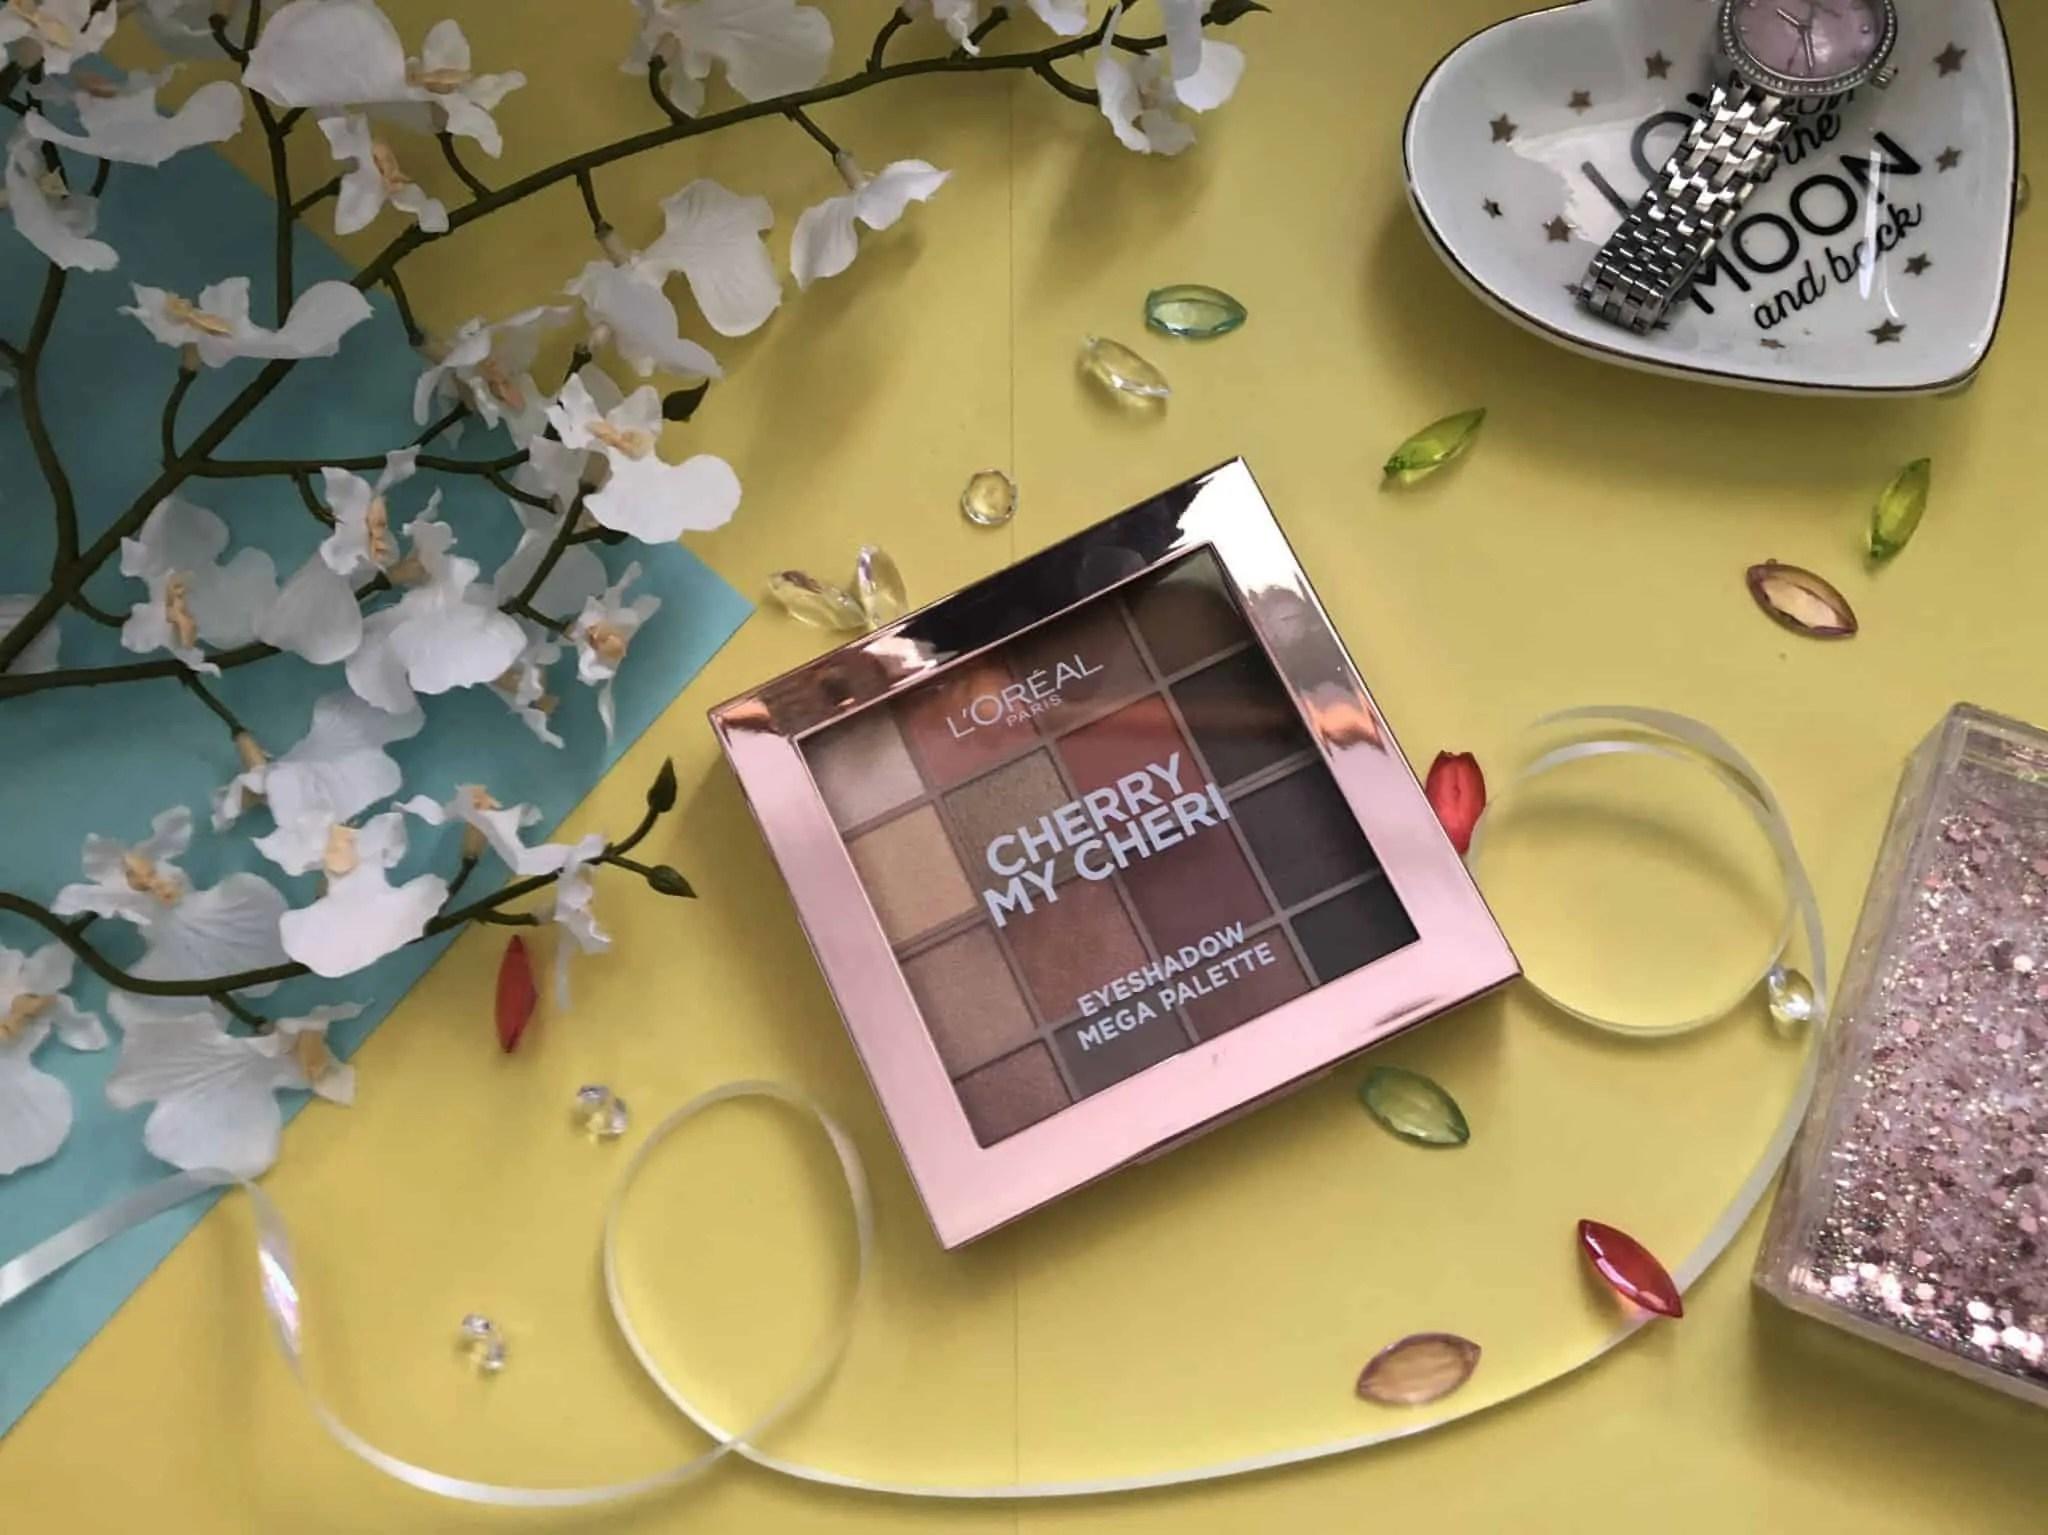 loreal cherry my cheri eyeshadow palette review